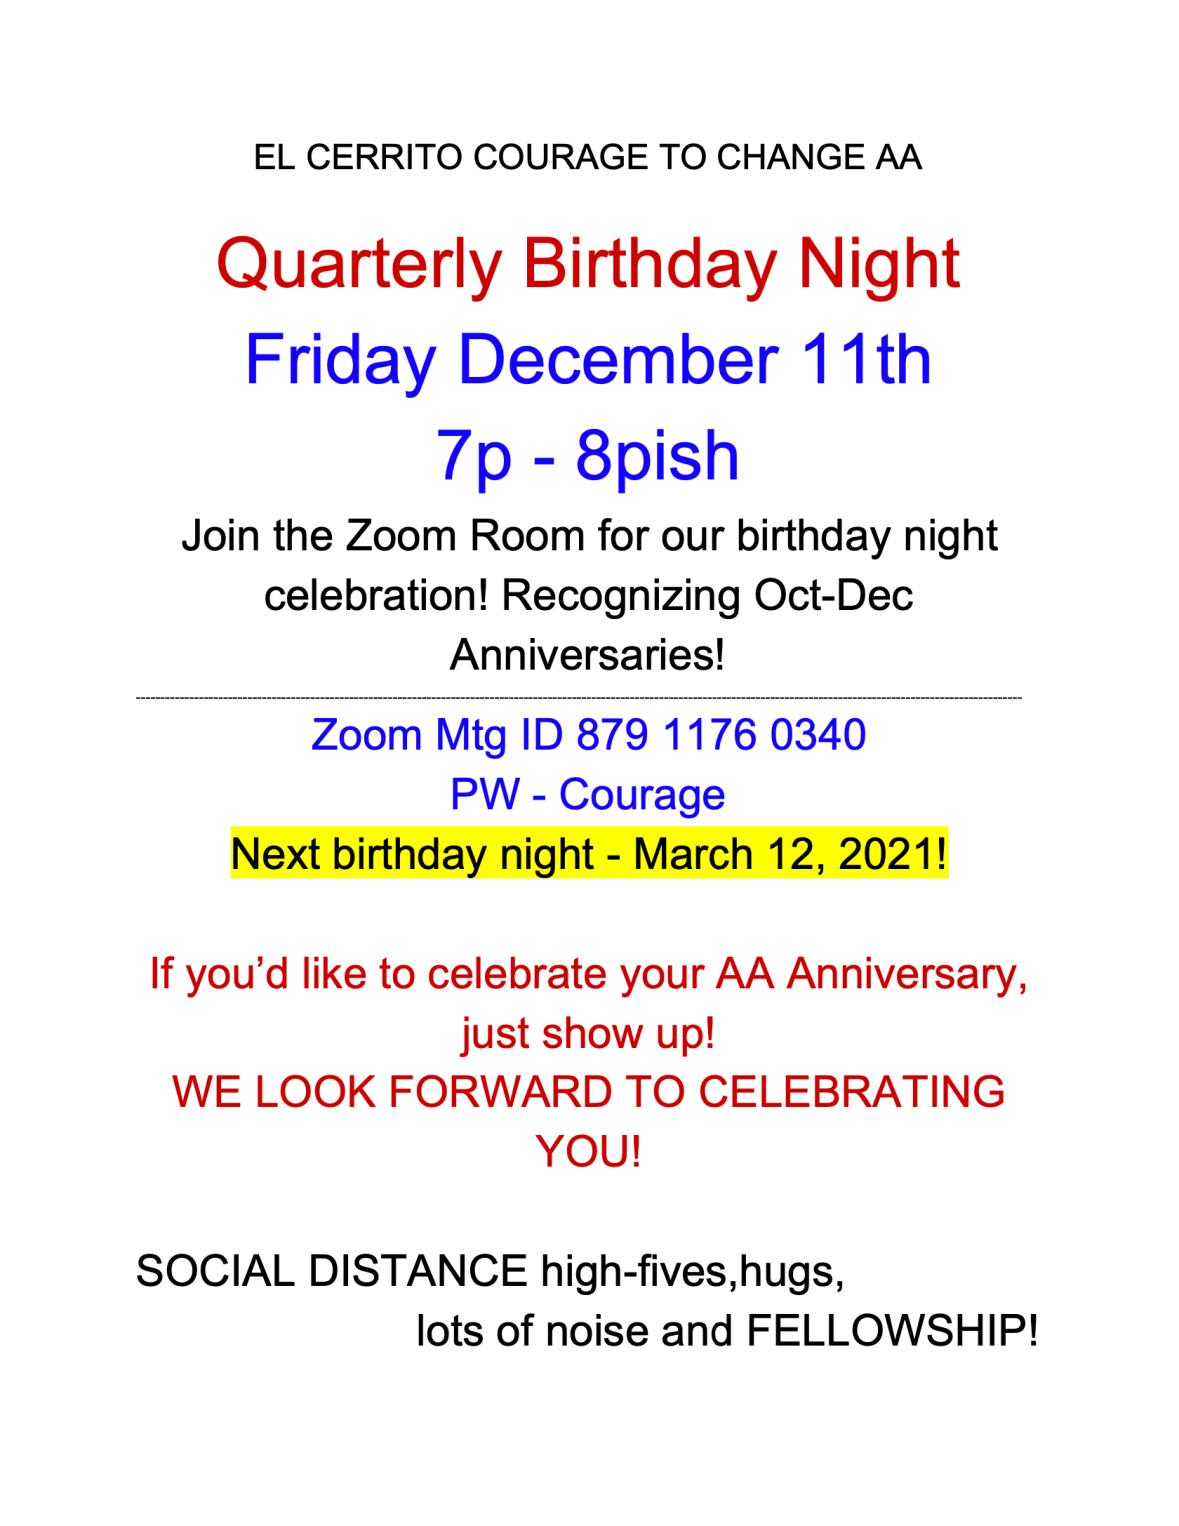 Dec 2020 B-day night flyer